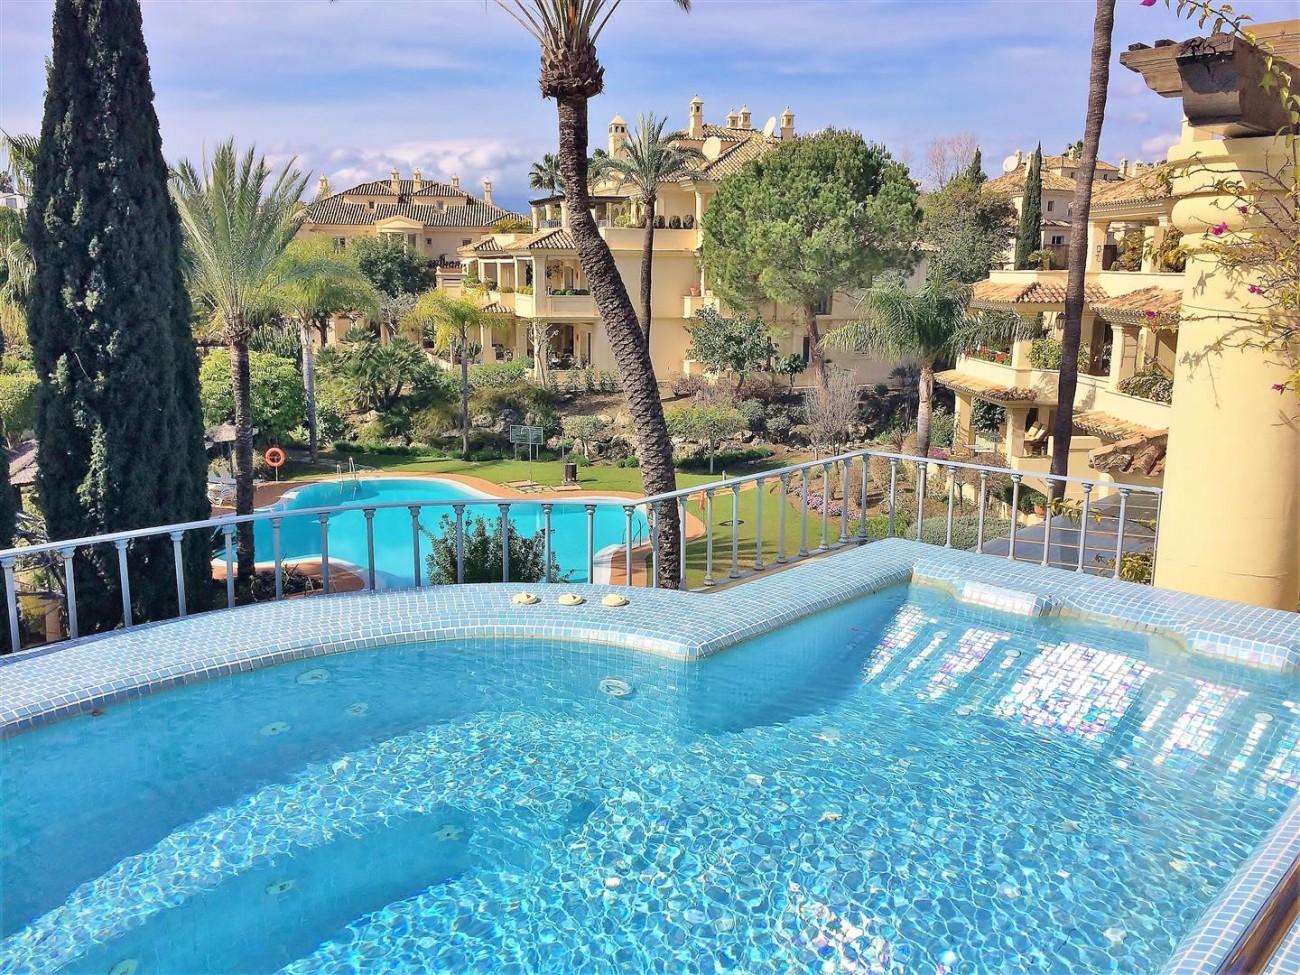 Penthouse for sale Las Alamandas Nueva Andalucia Marbella Spain (20) (Large)